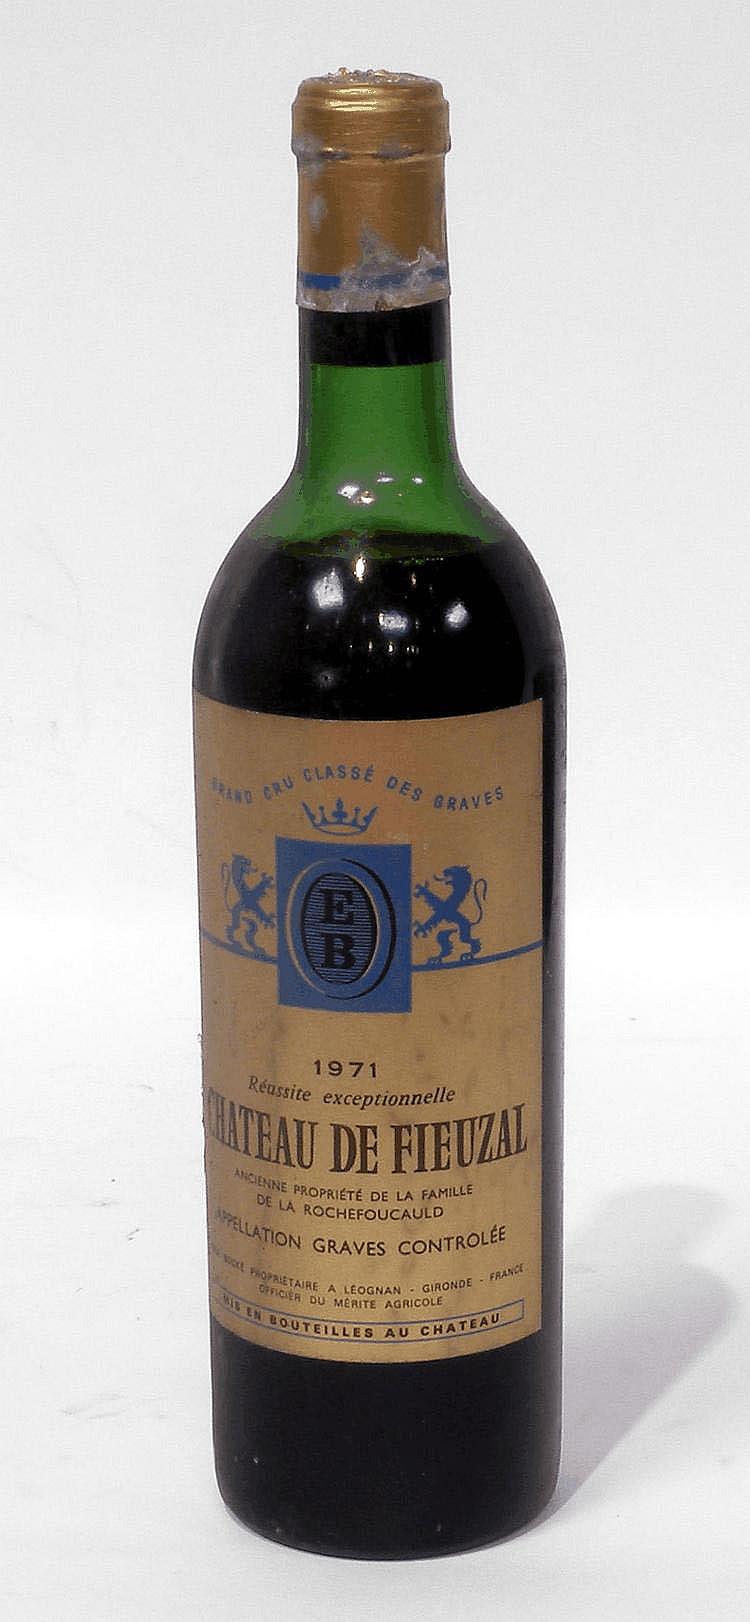 12 Bouteilles de CHÂTEAU FIEUZAL, grand cru classé, 1971.